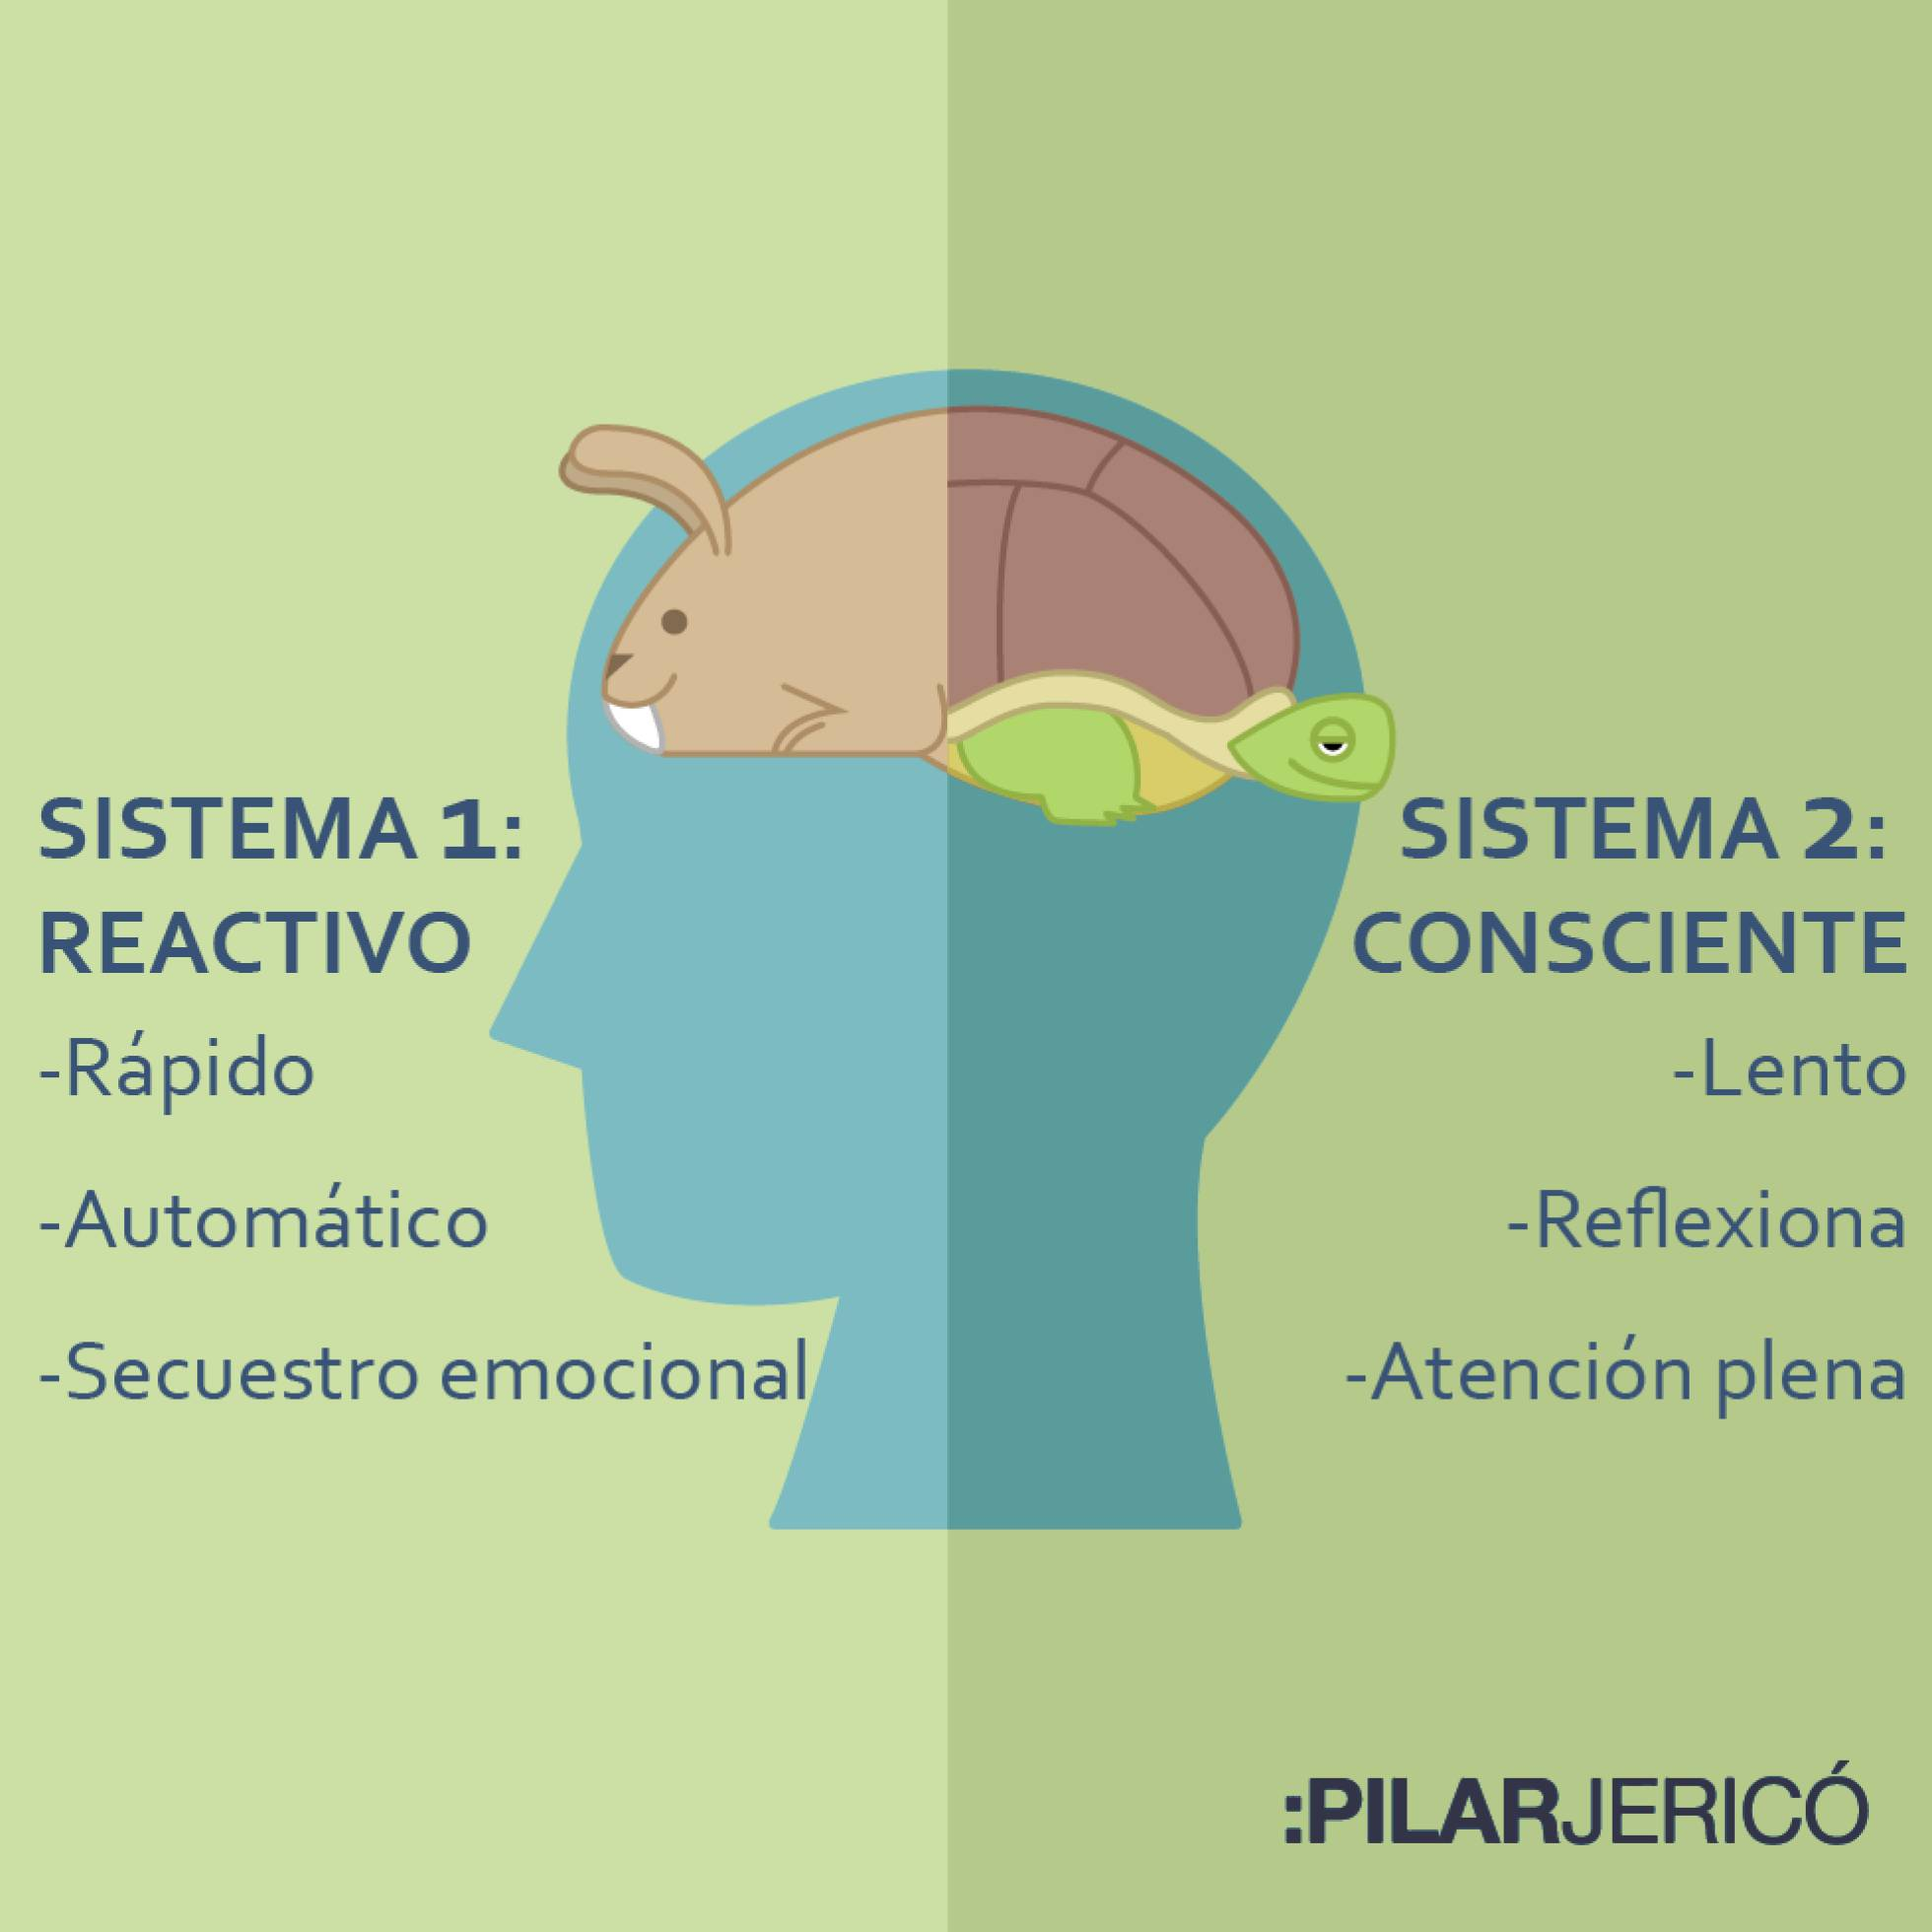 sistema neuronales